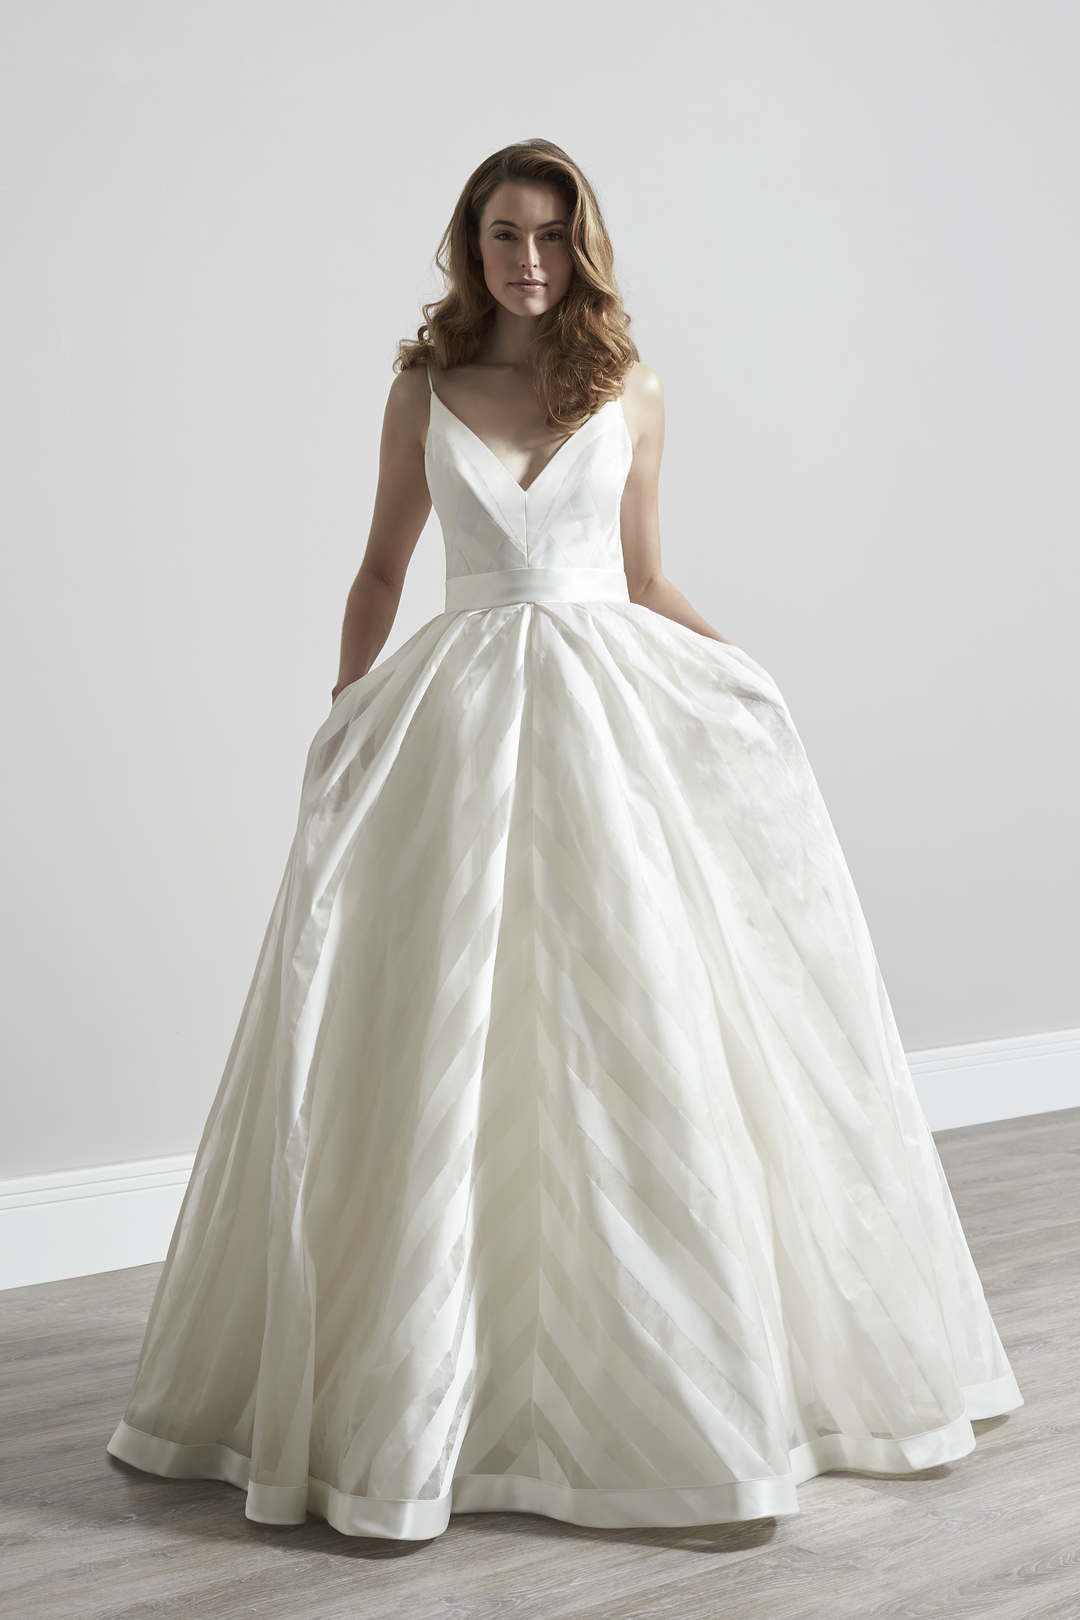 Dress main 2x 1546965128